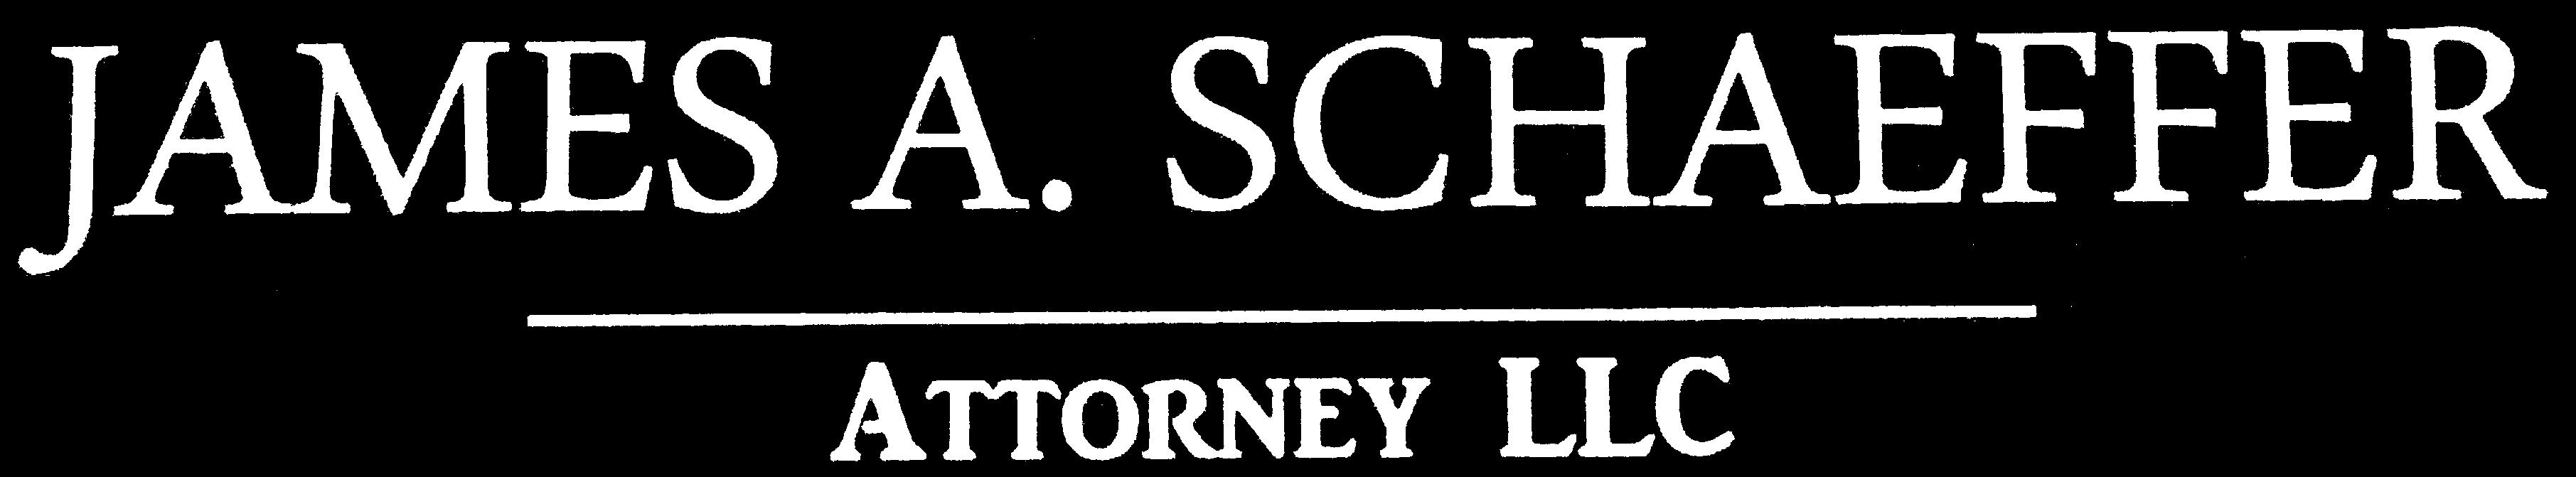 James A Schaeffer Attorney Llc La Grande Oregon